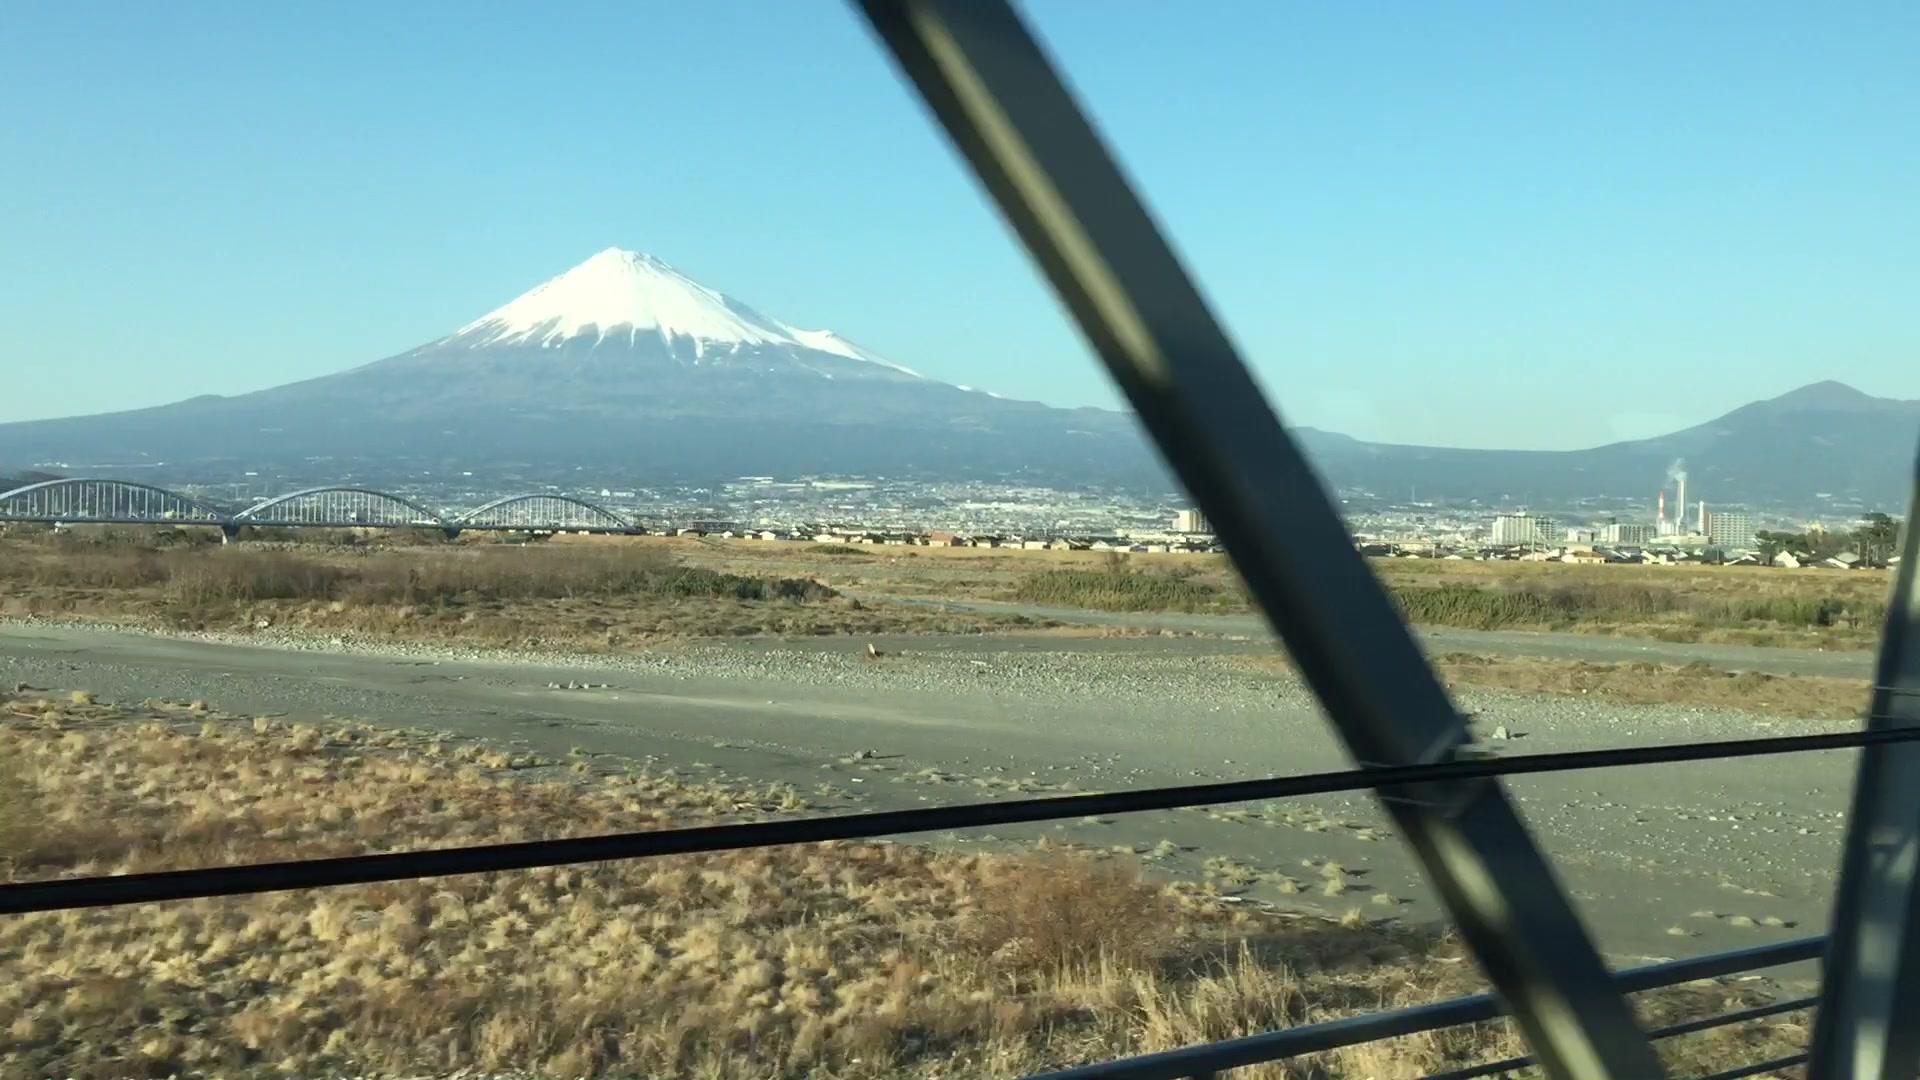 Riding Japanese Bullet Train | Autoblog Short Cuts